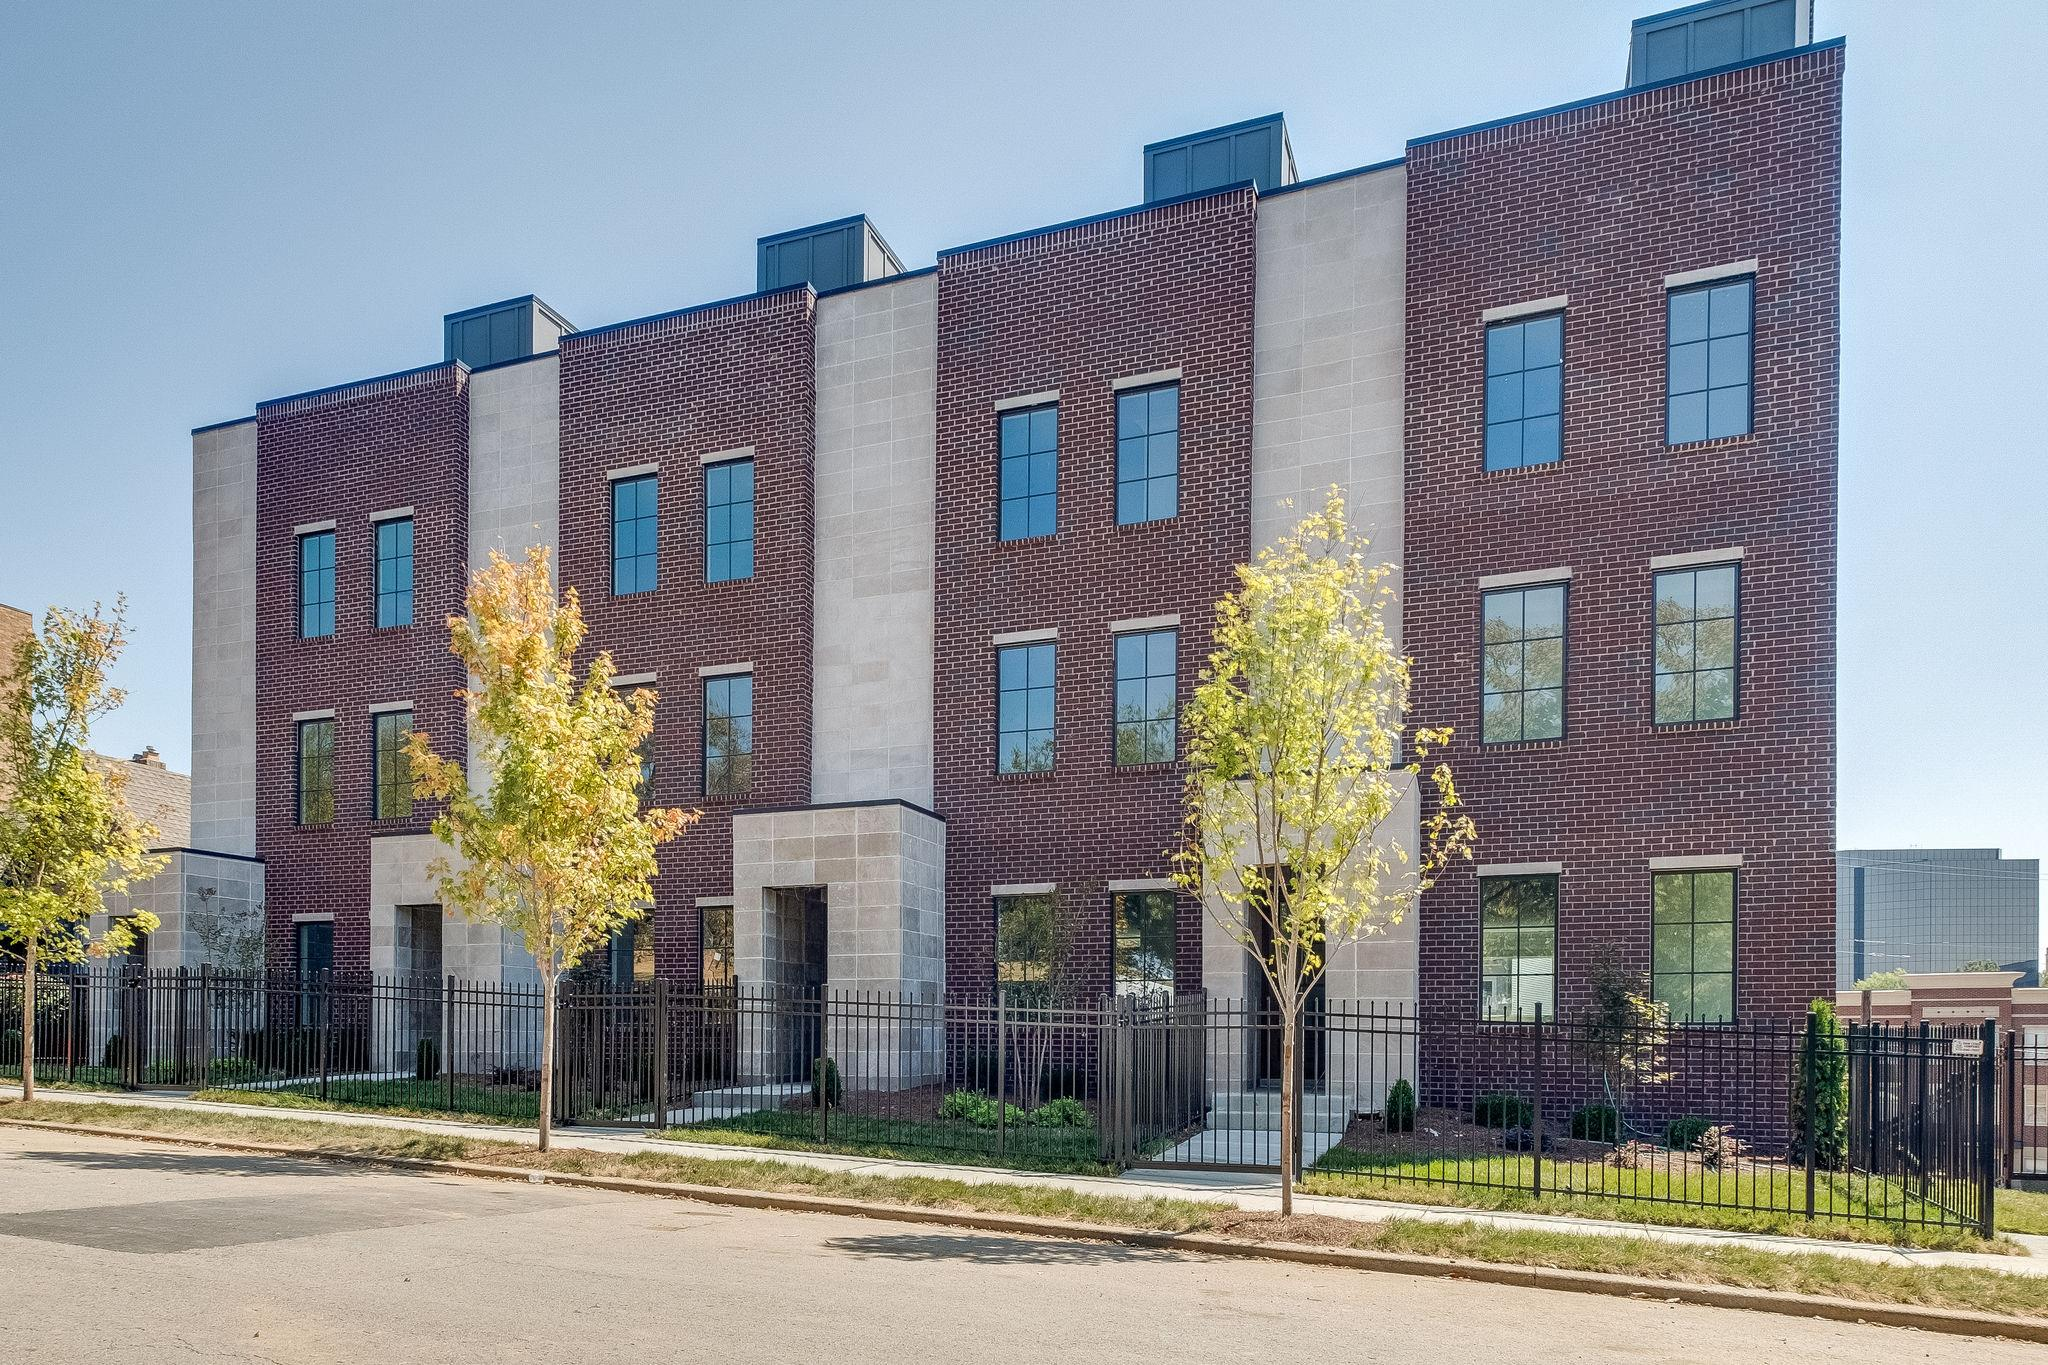 3131C Parthenon Ave, Nashville, TN 37203 - Nashville, TN real estate listing